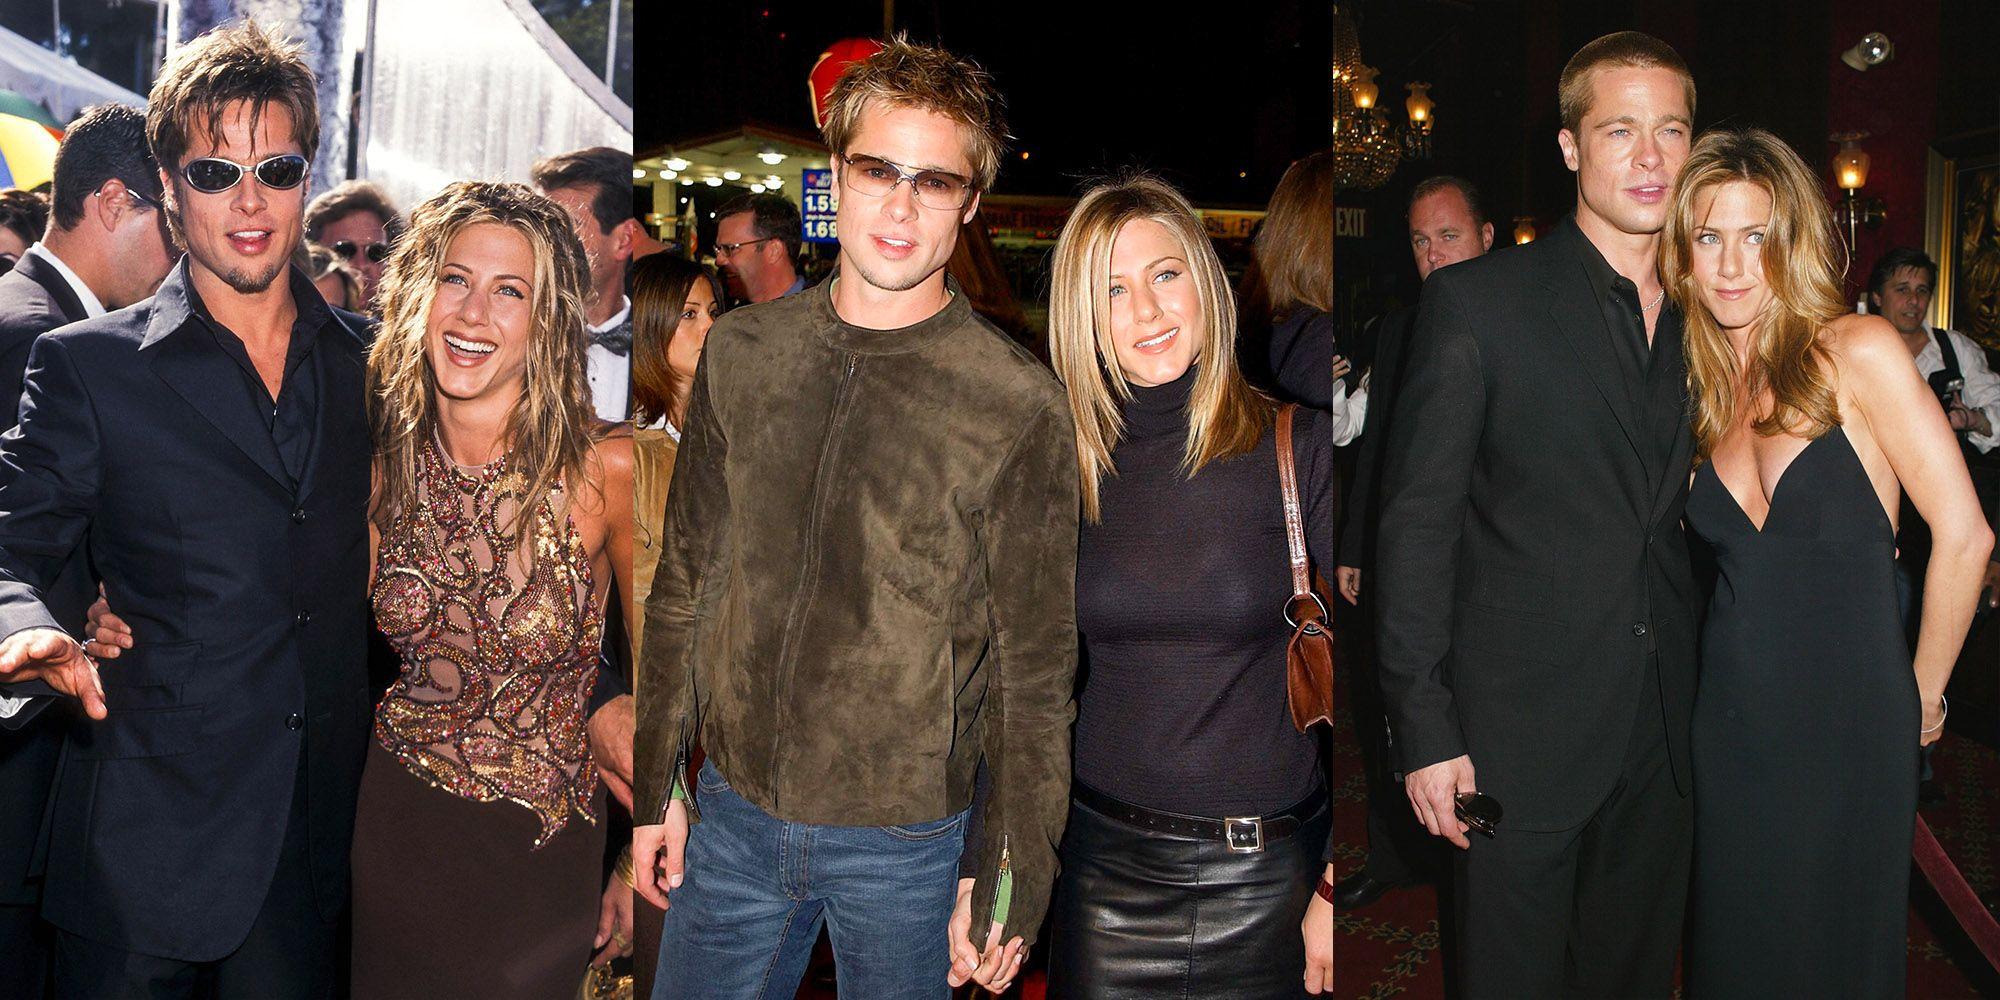 Jennifer aniston dating timeline for teens